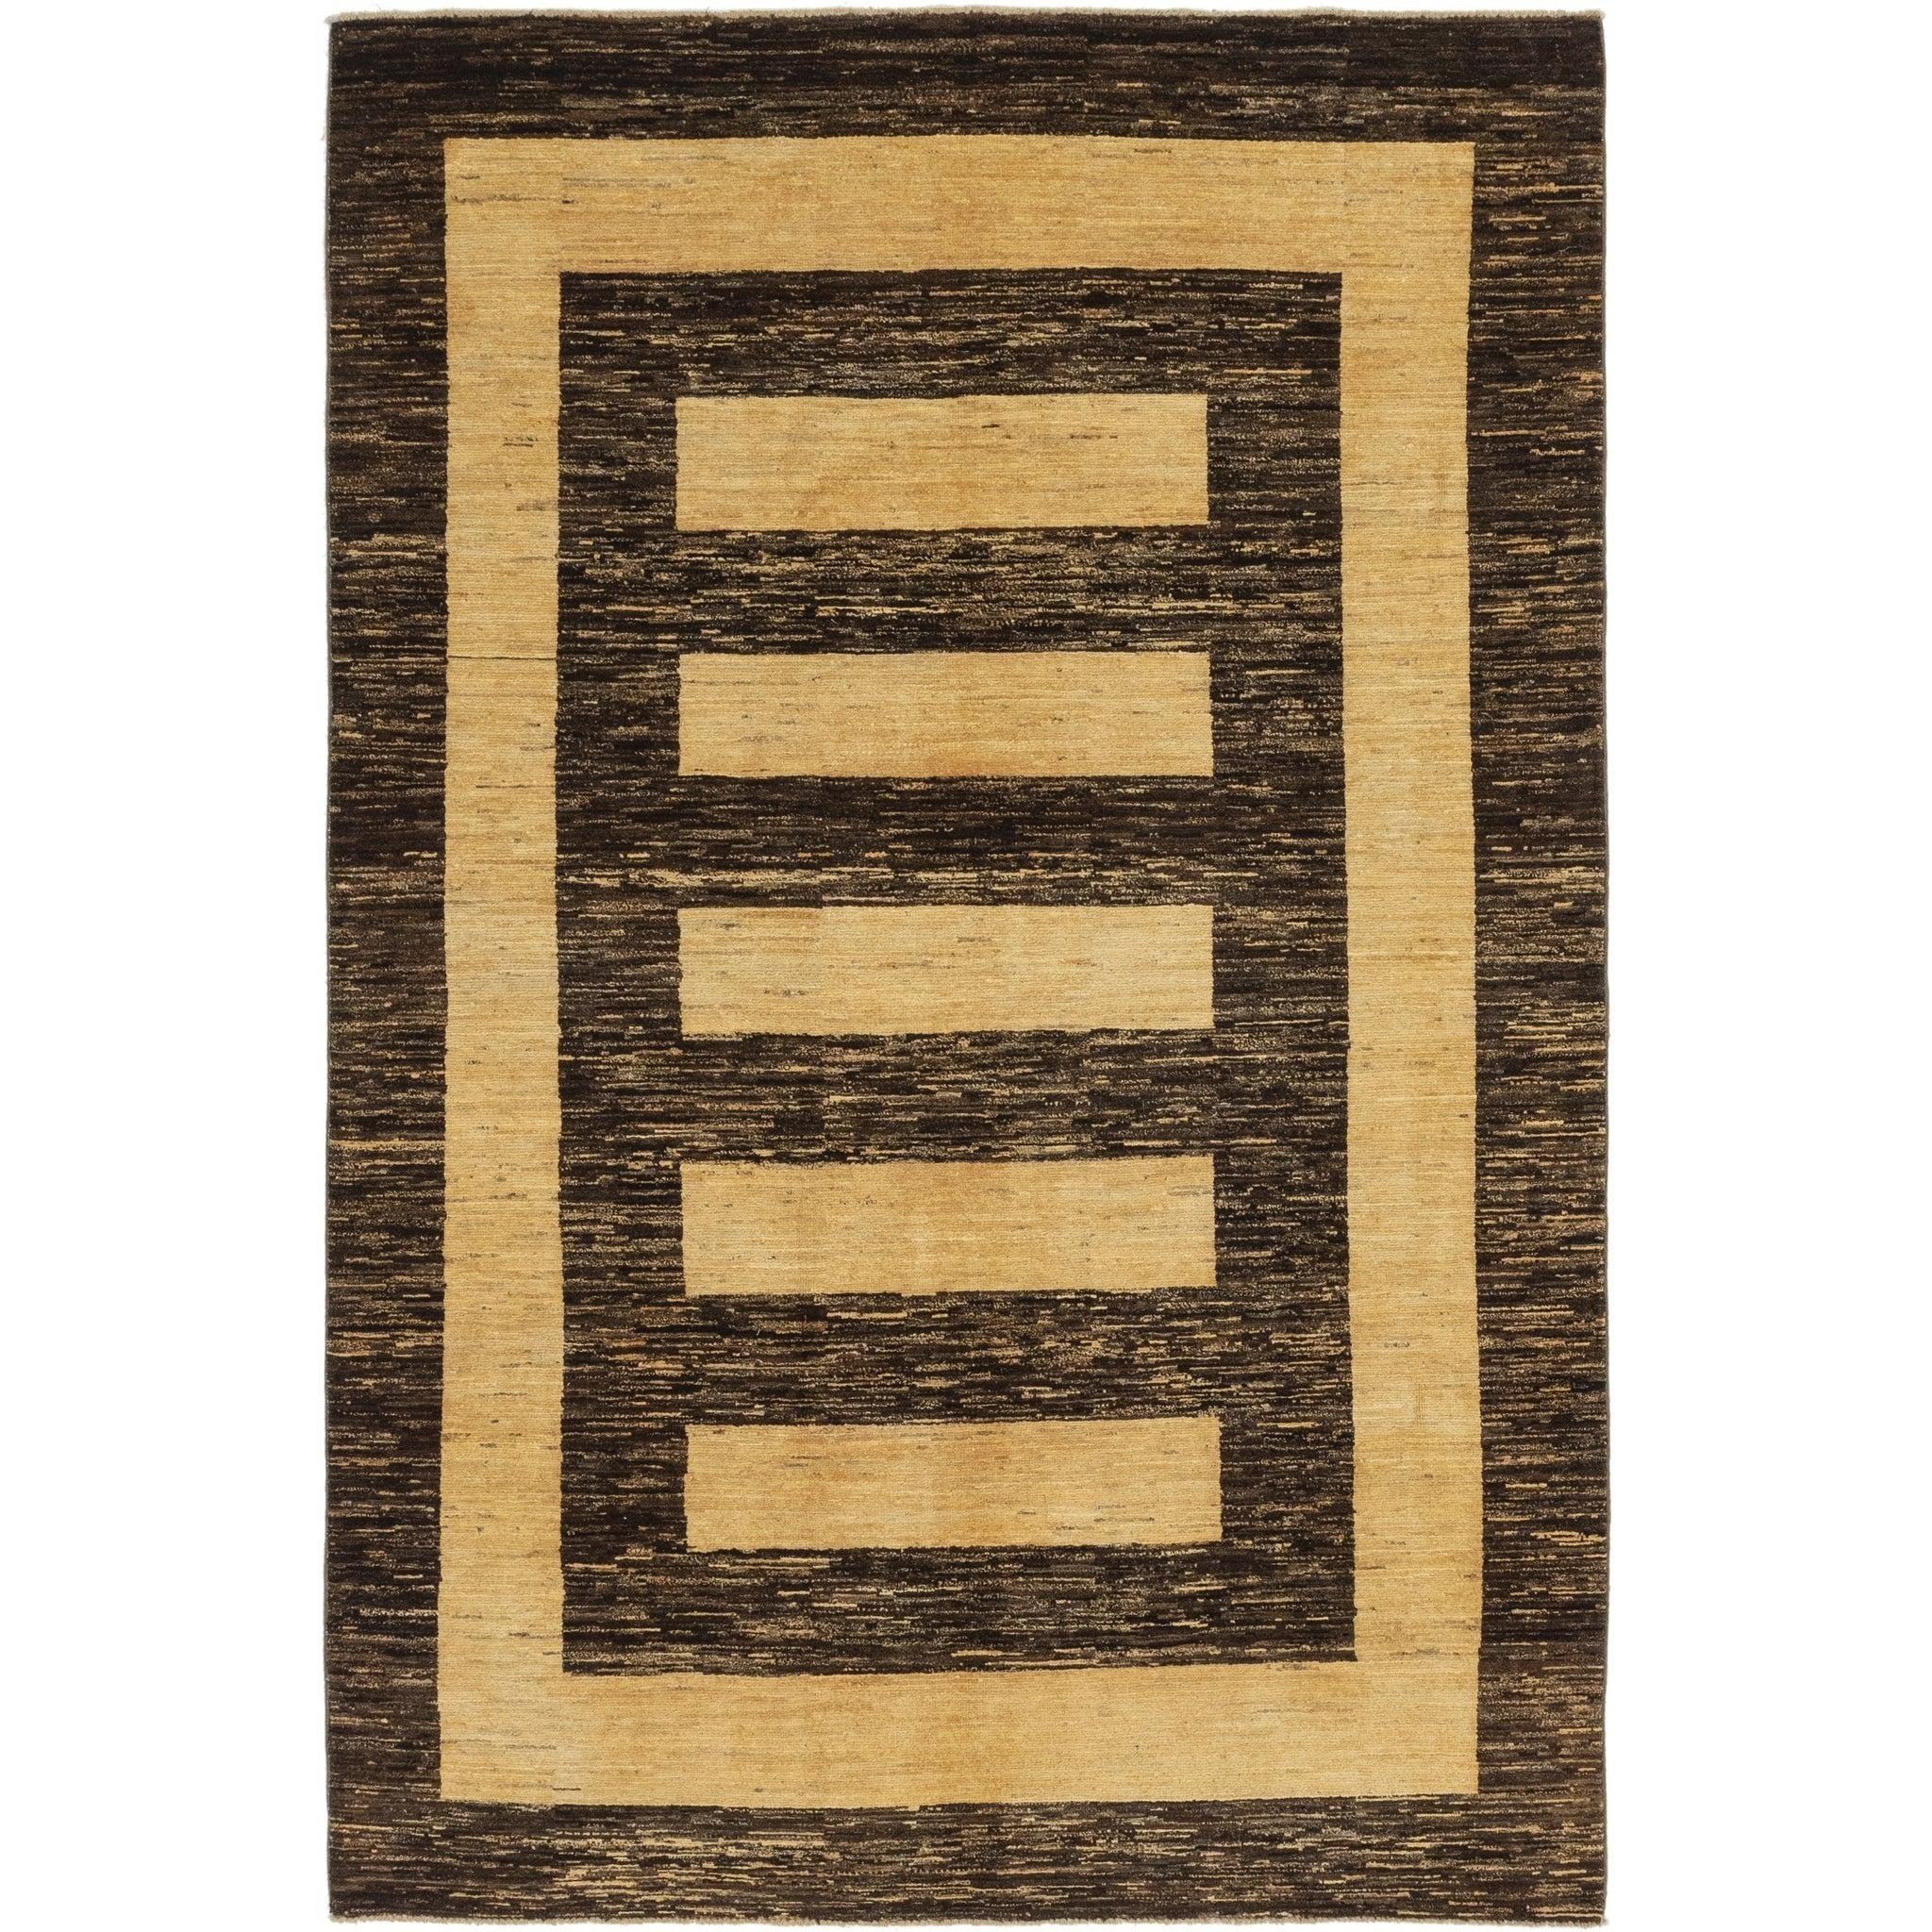 Hand Knotted Kashkuli Gabbeh Wool Area Rug - 5 9 x 8 9 (Dark brown - 5 9 x 8 9)